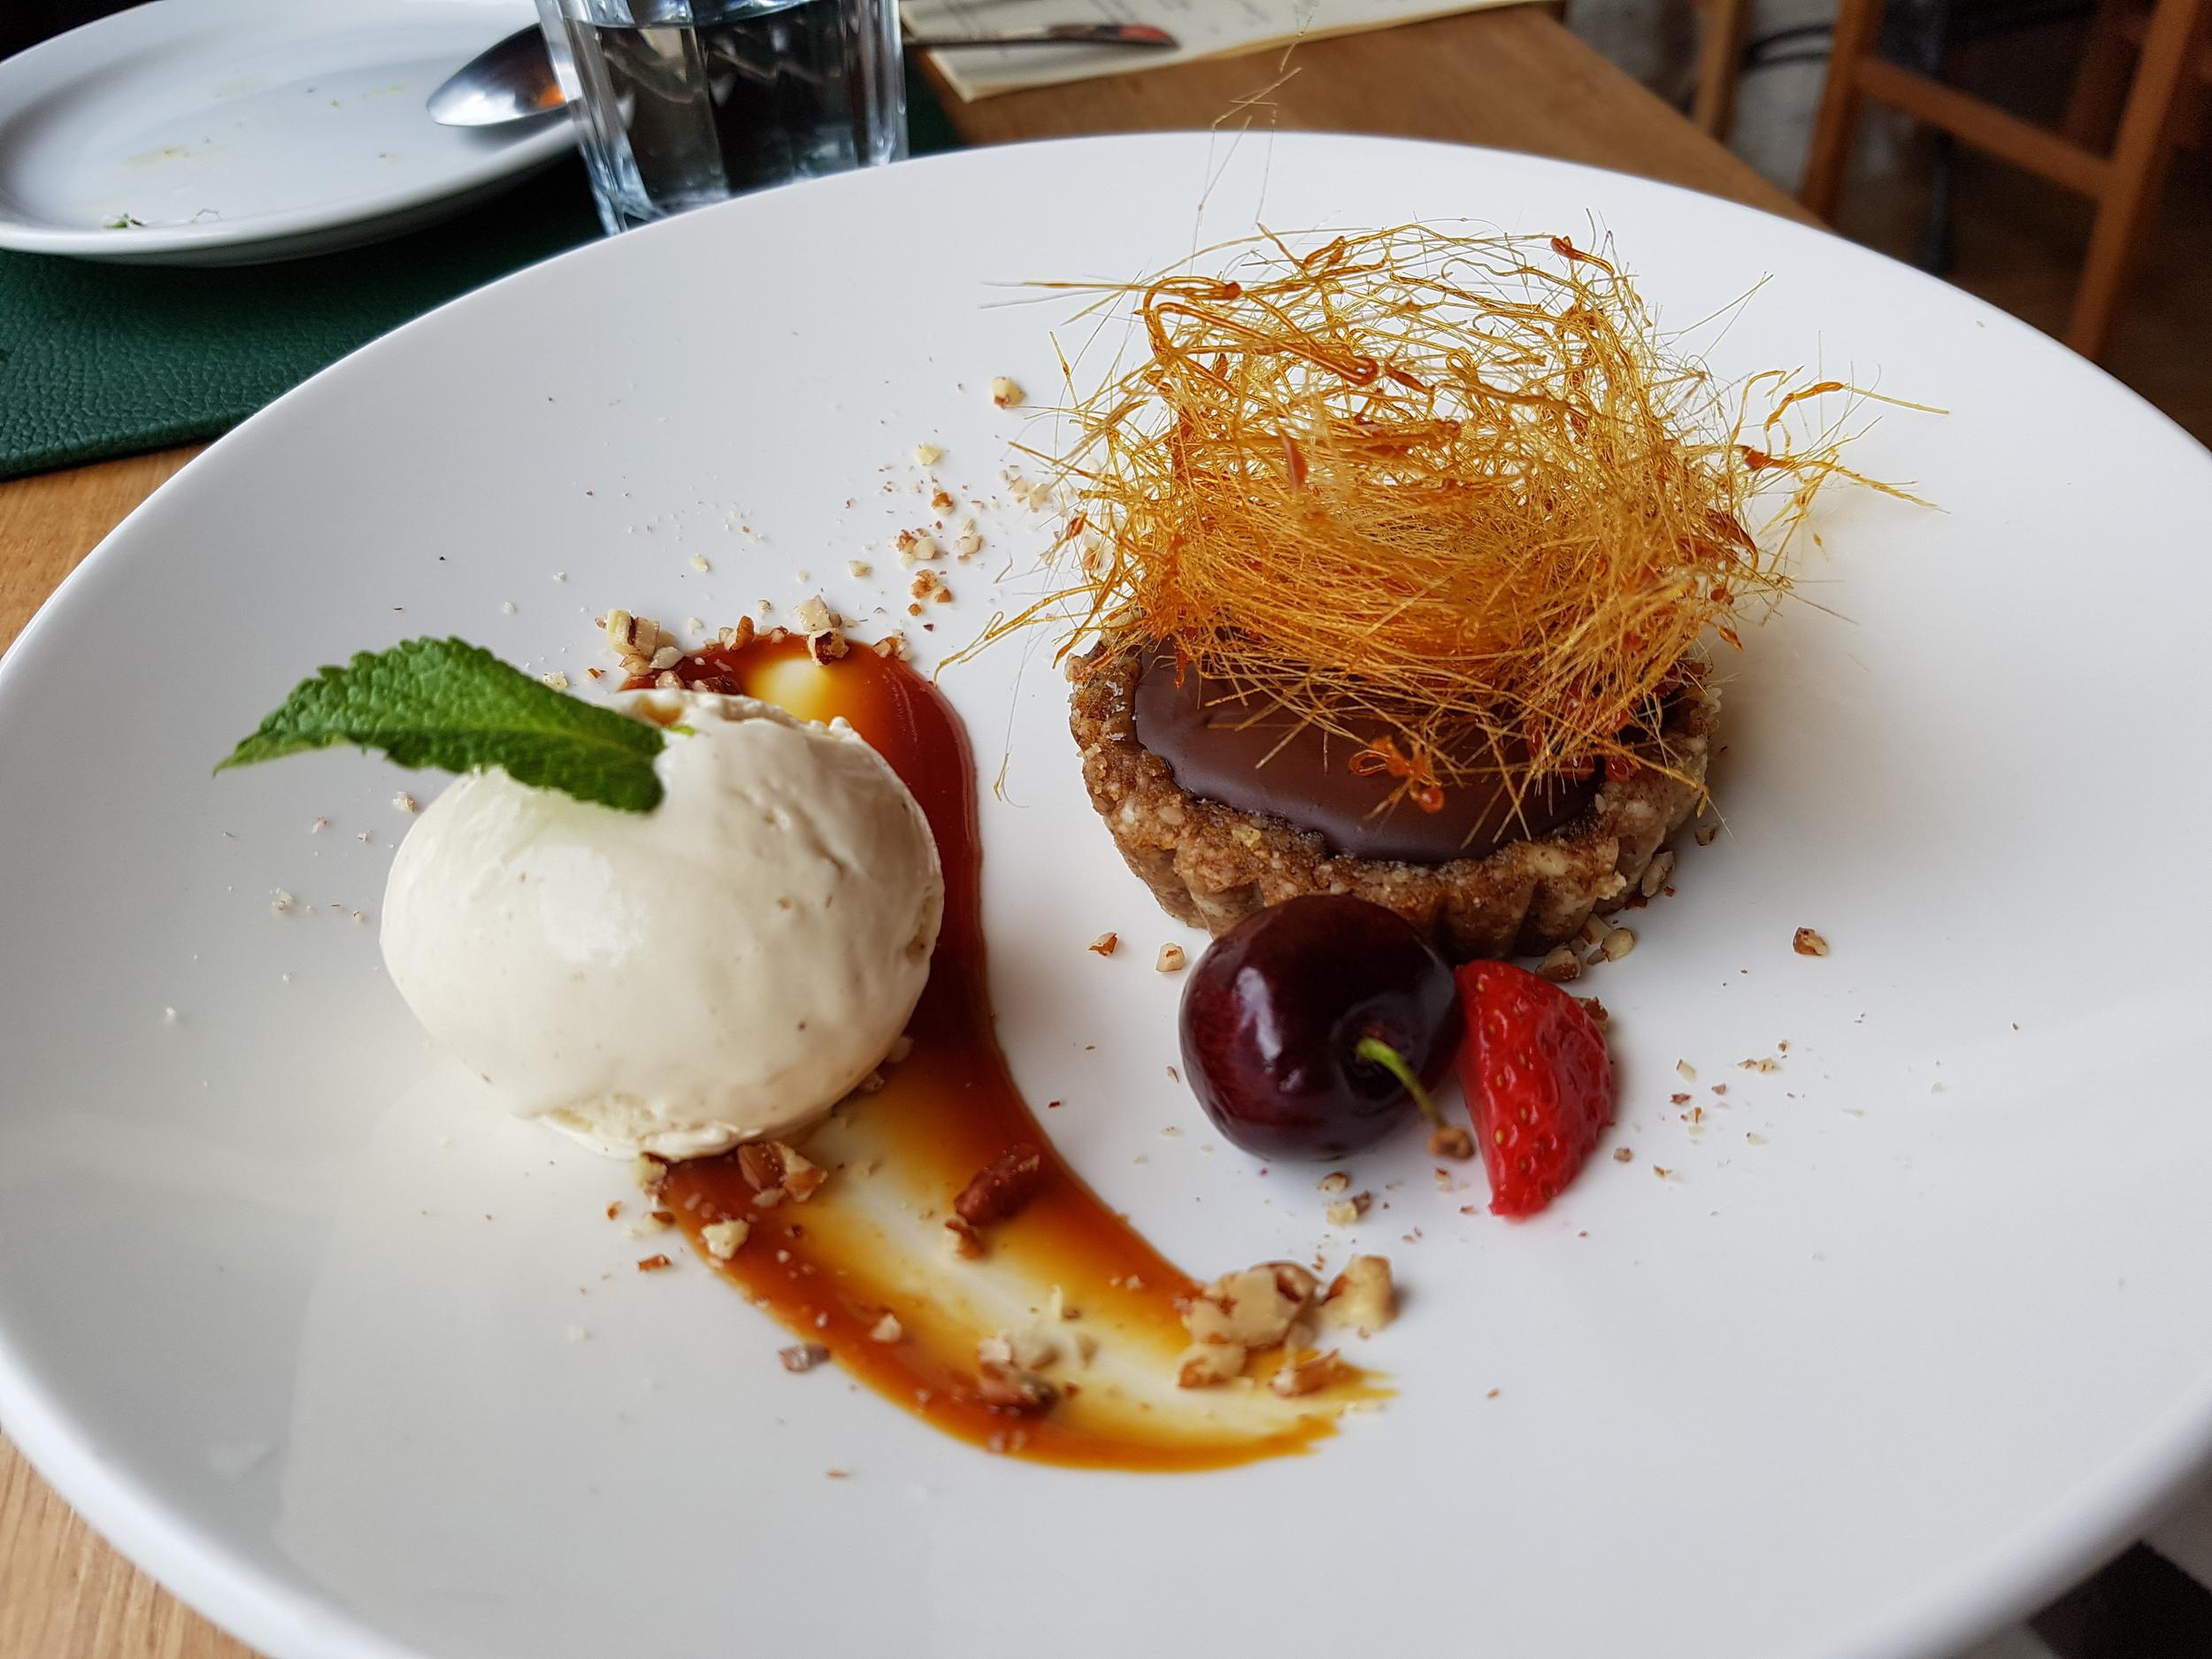 Chocolate ganache tart with a mixed nut and date base, salted caramel, spun sugar and vanilla ice cream